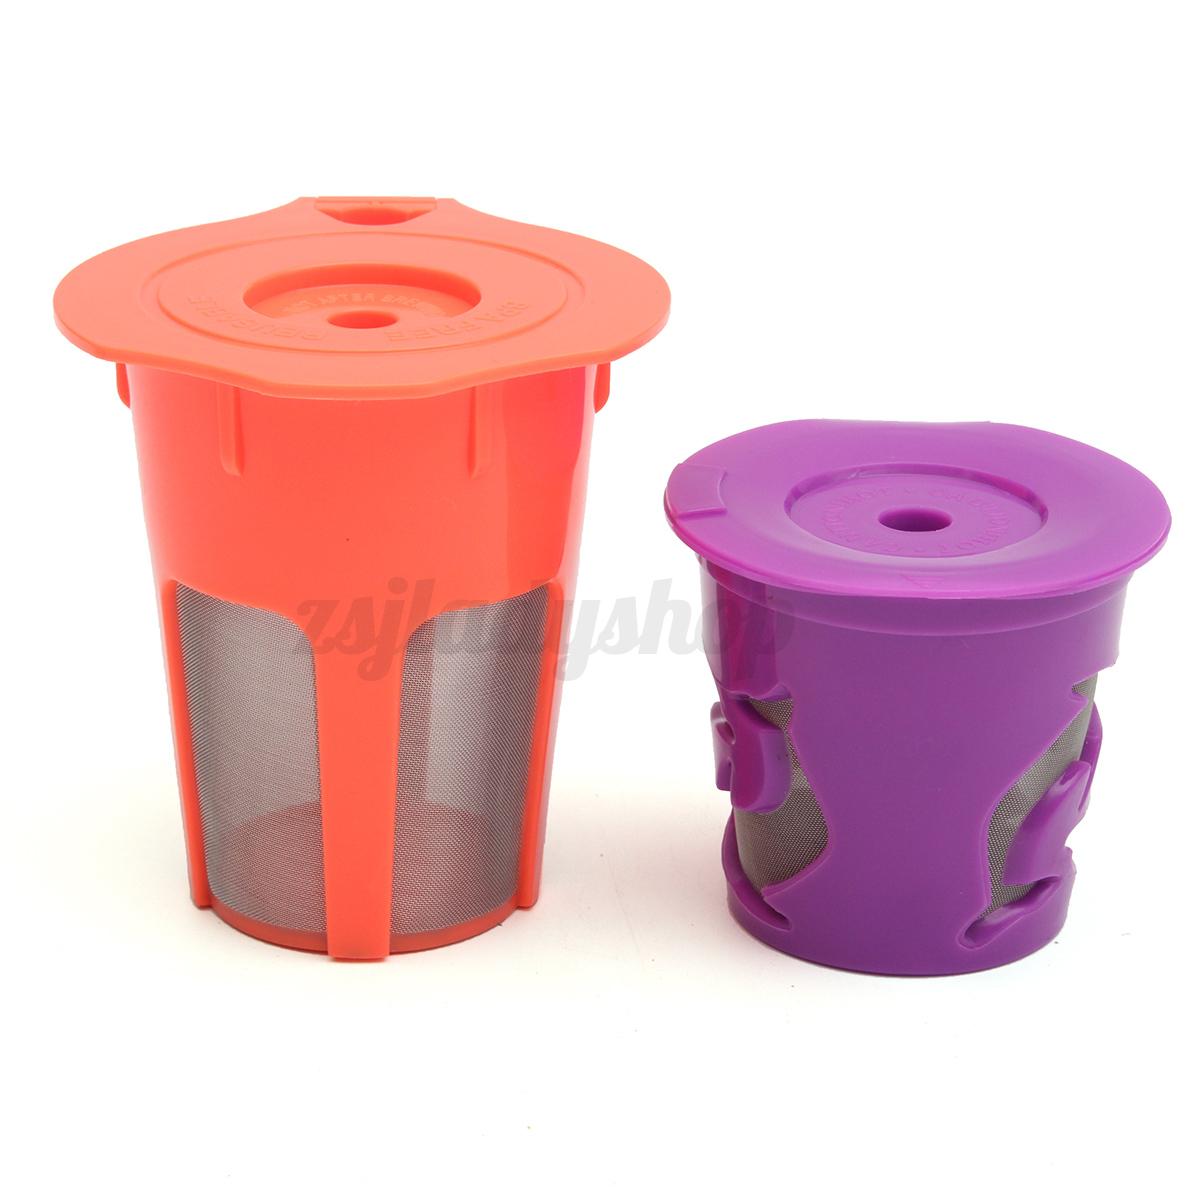 2x K-Cups K-Carafe Refillable Reusable Carafe Coffee Filter Combo For Keurig 2.0